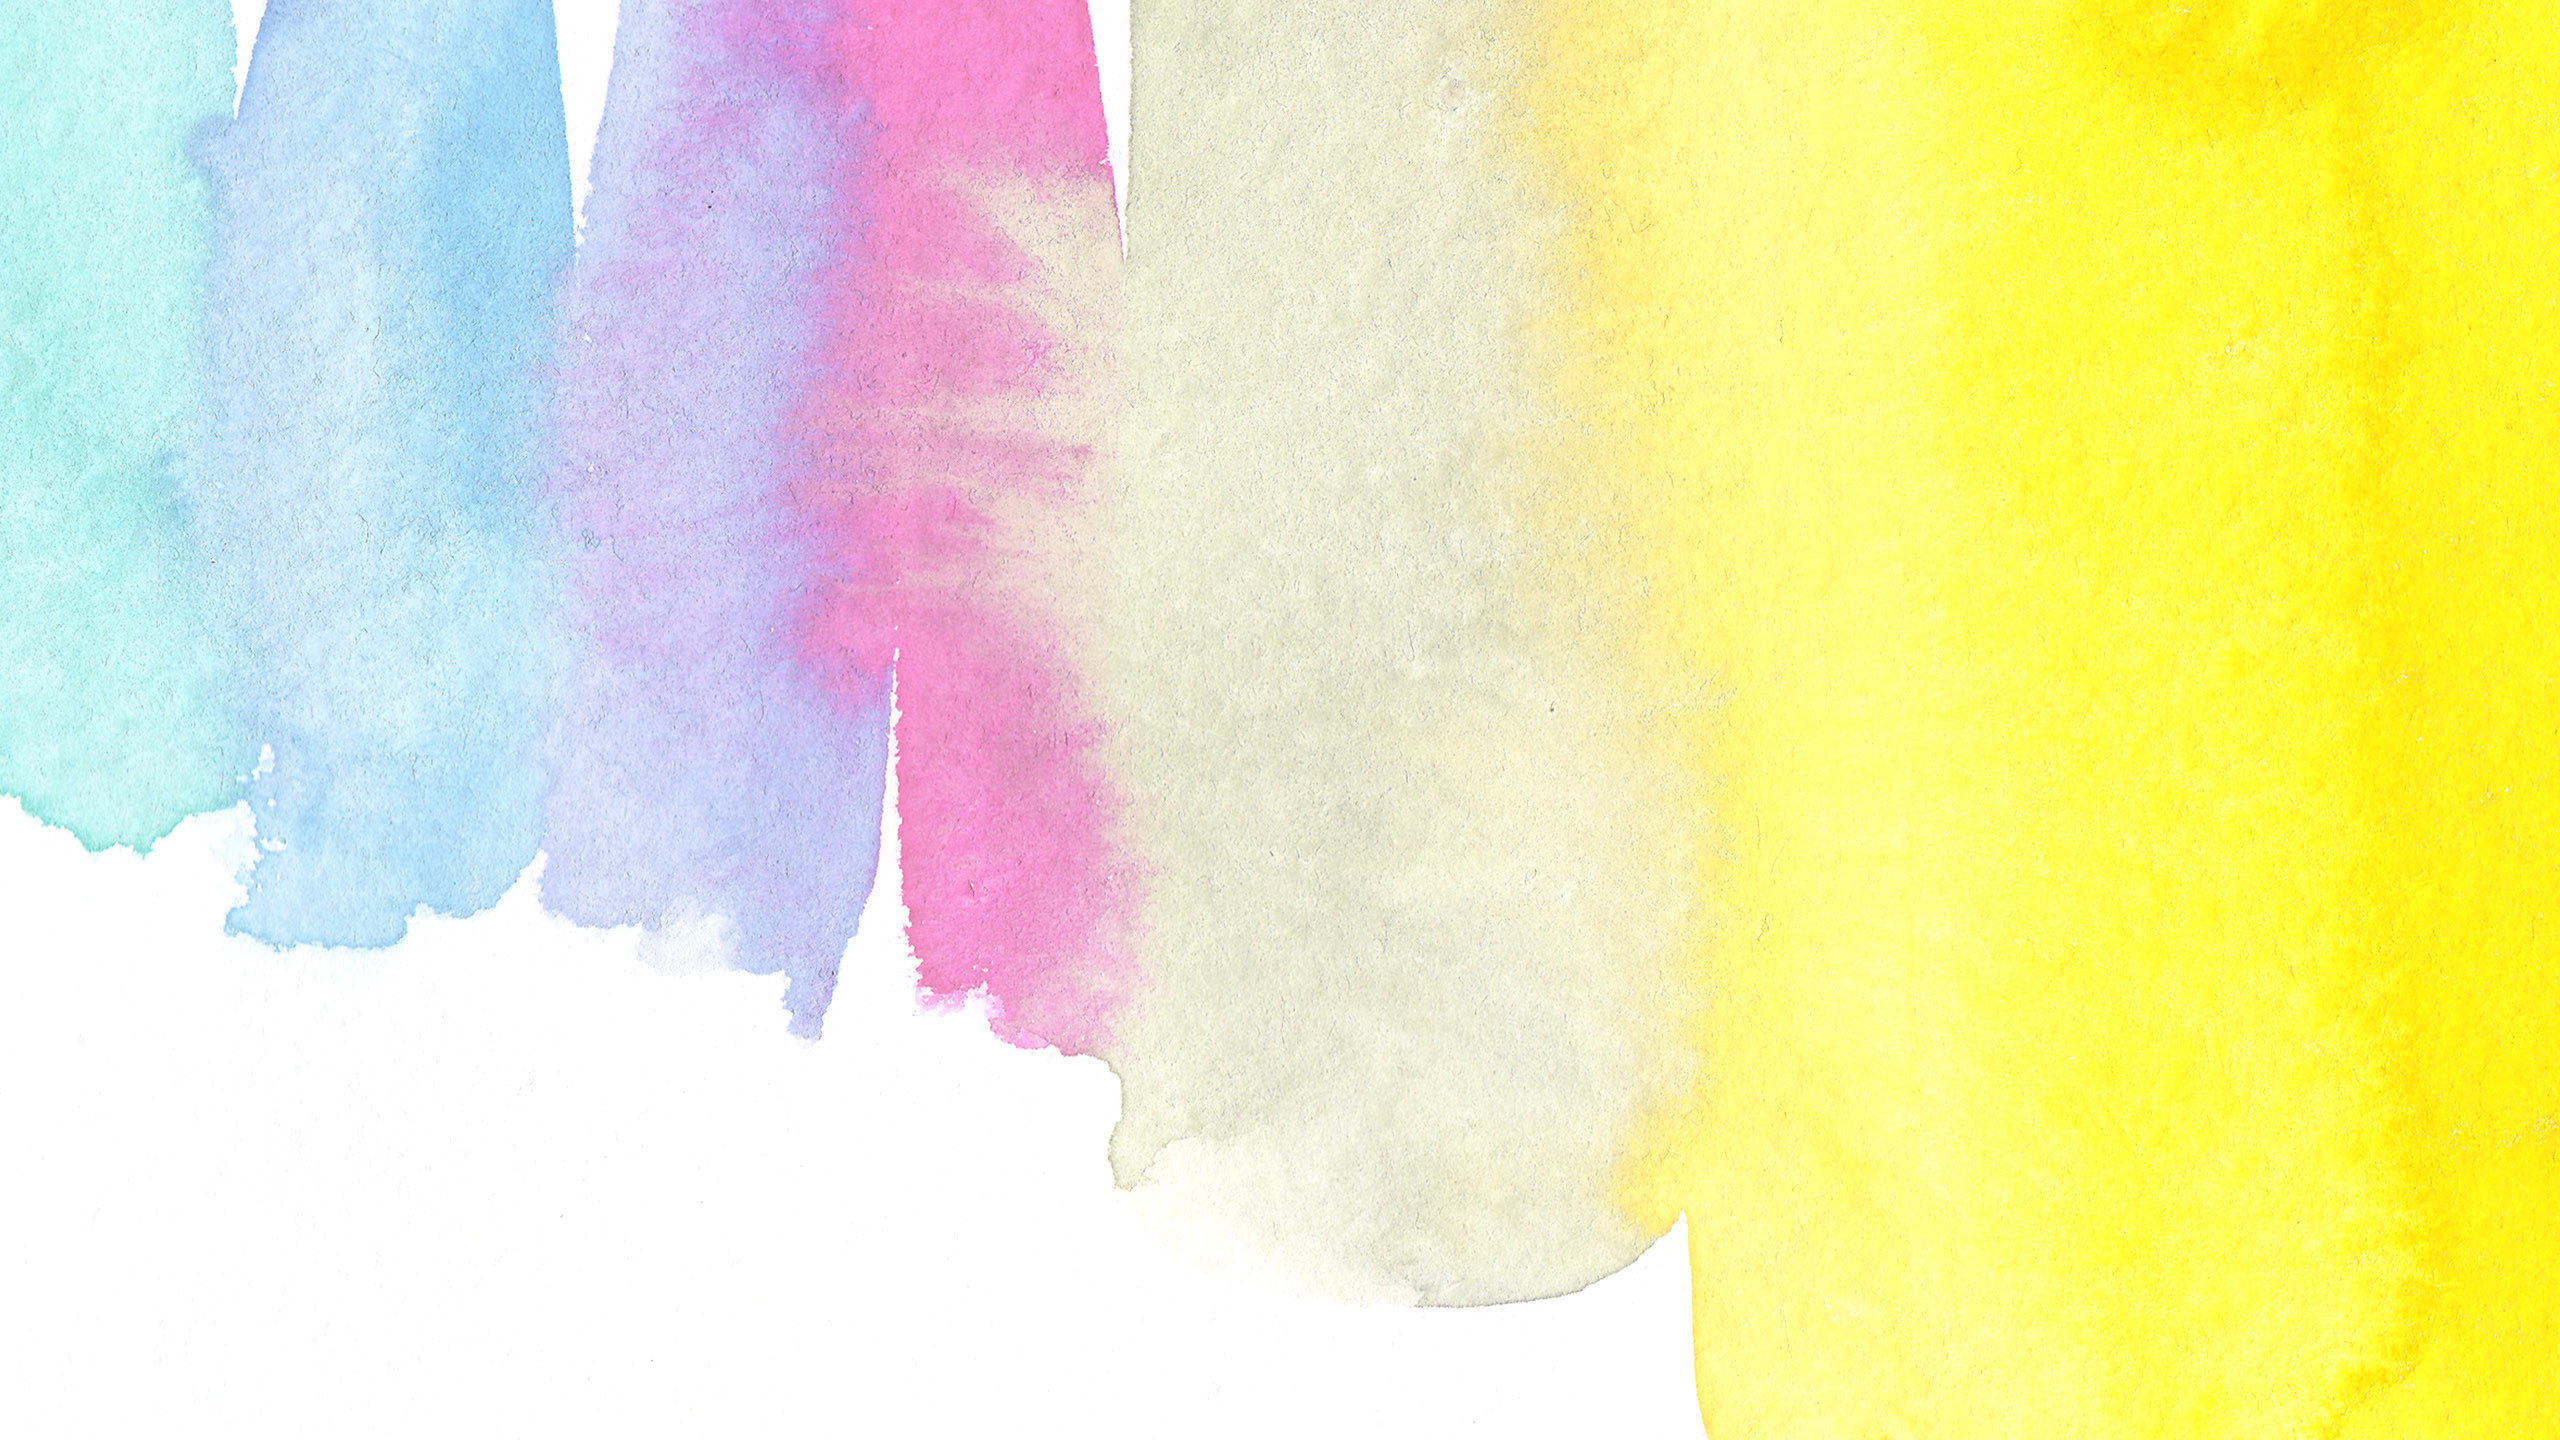 Free wallpaper // 004